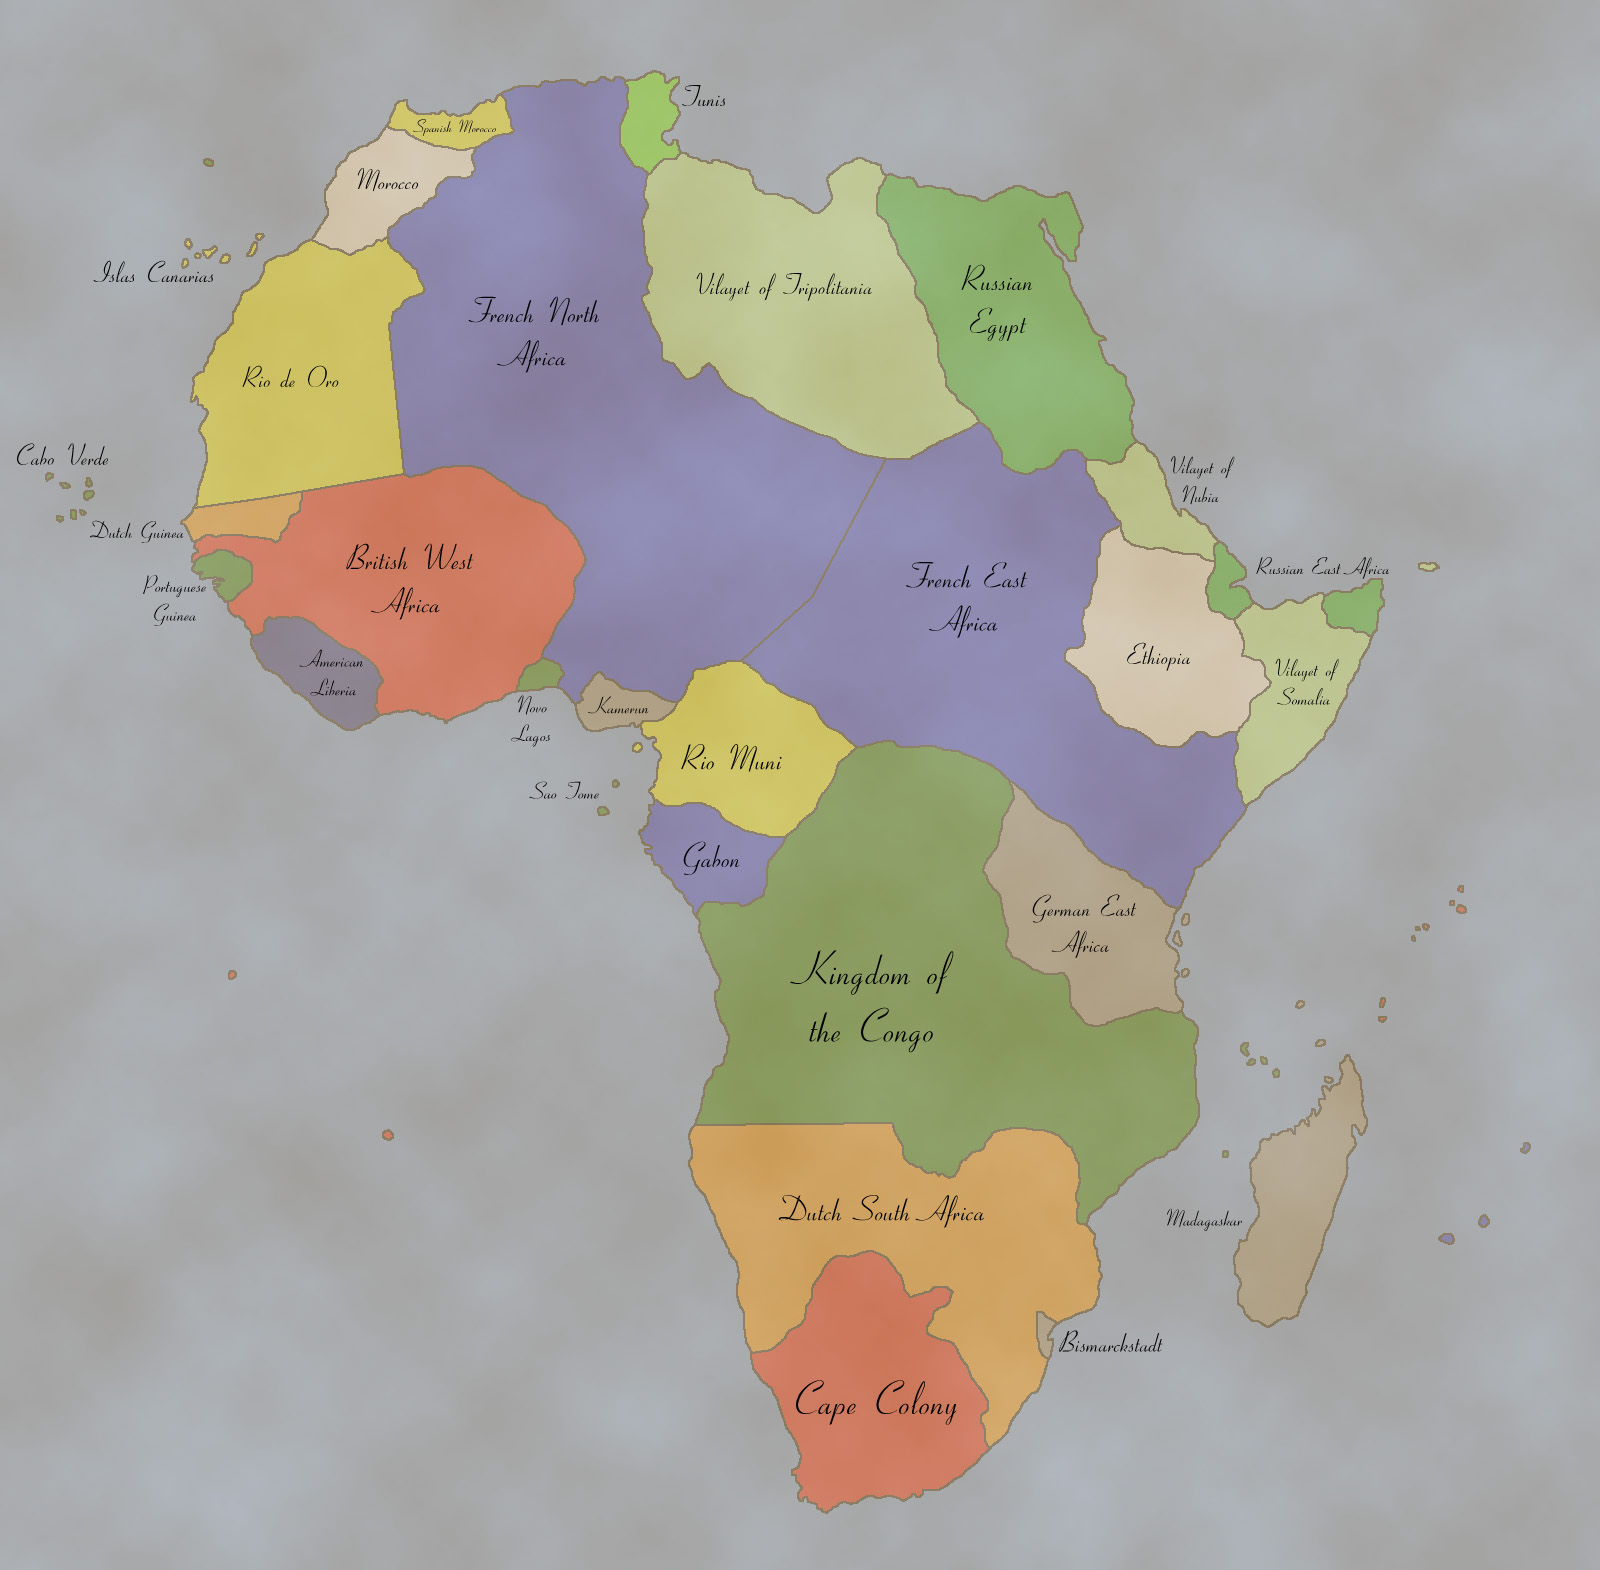 Africa_Map_Challenge.jpg